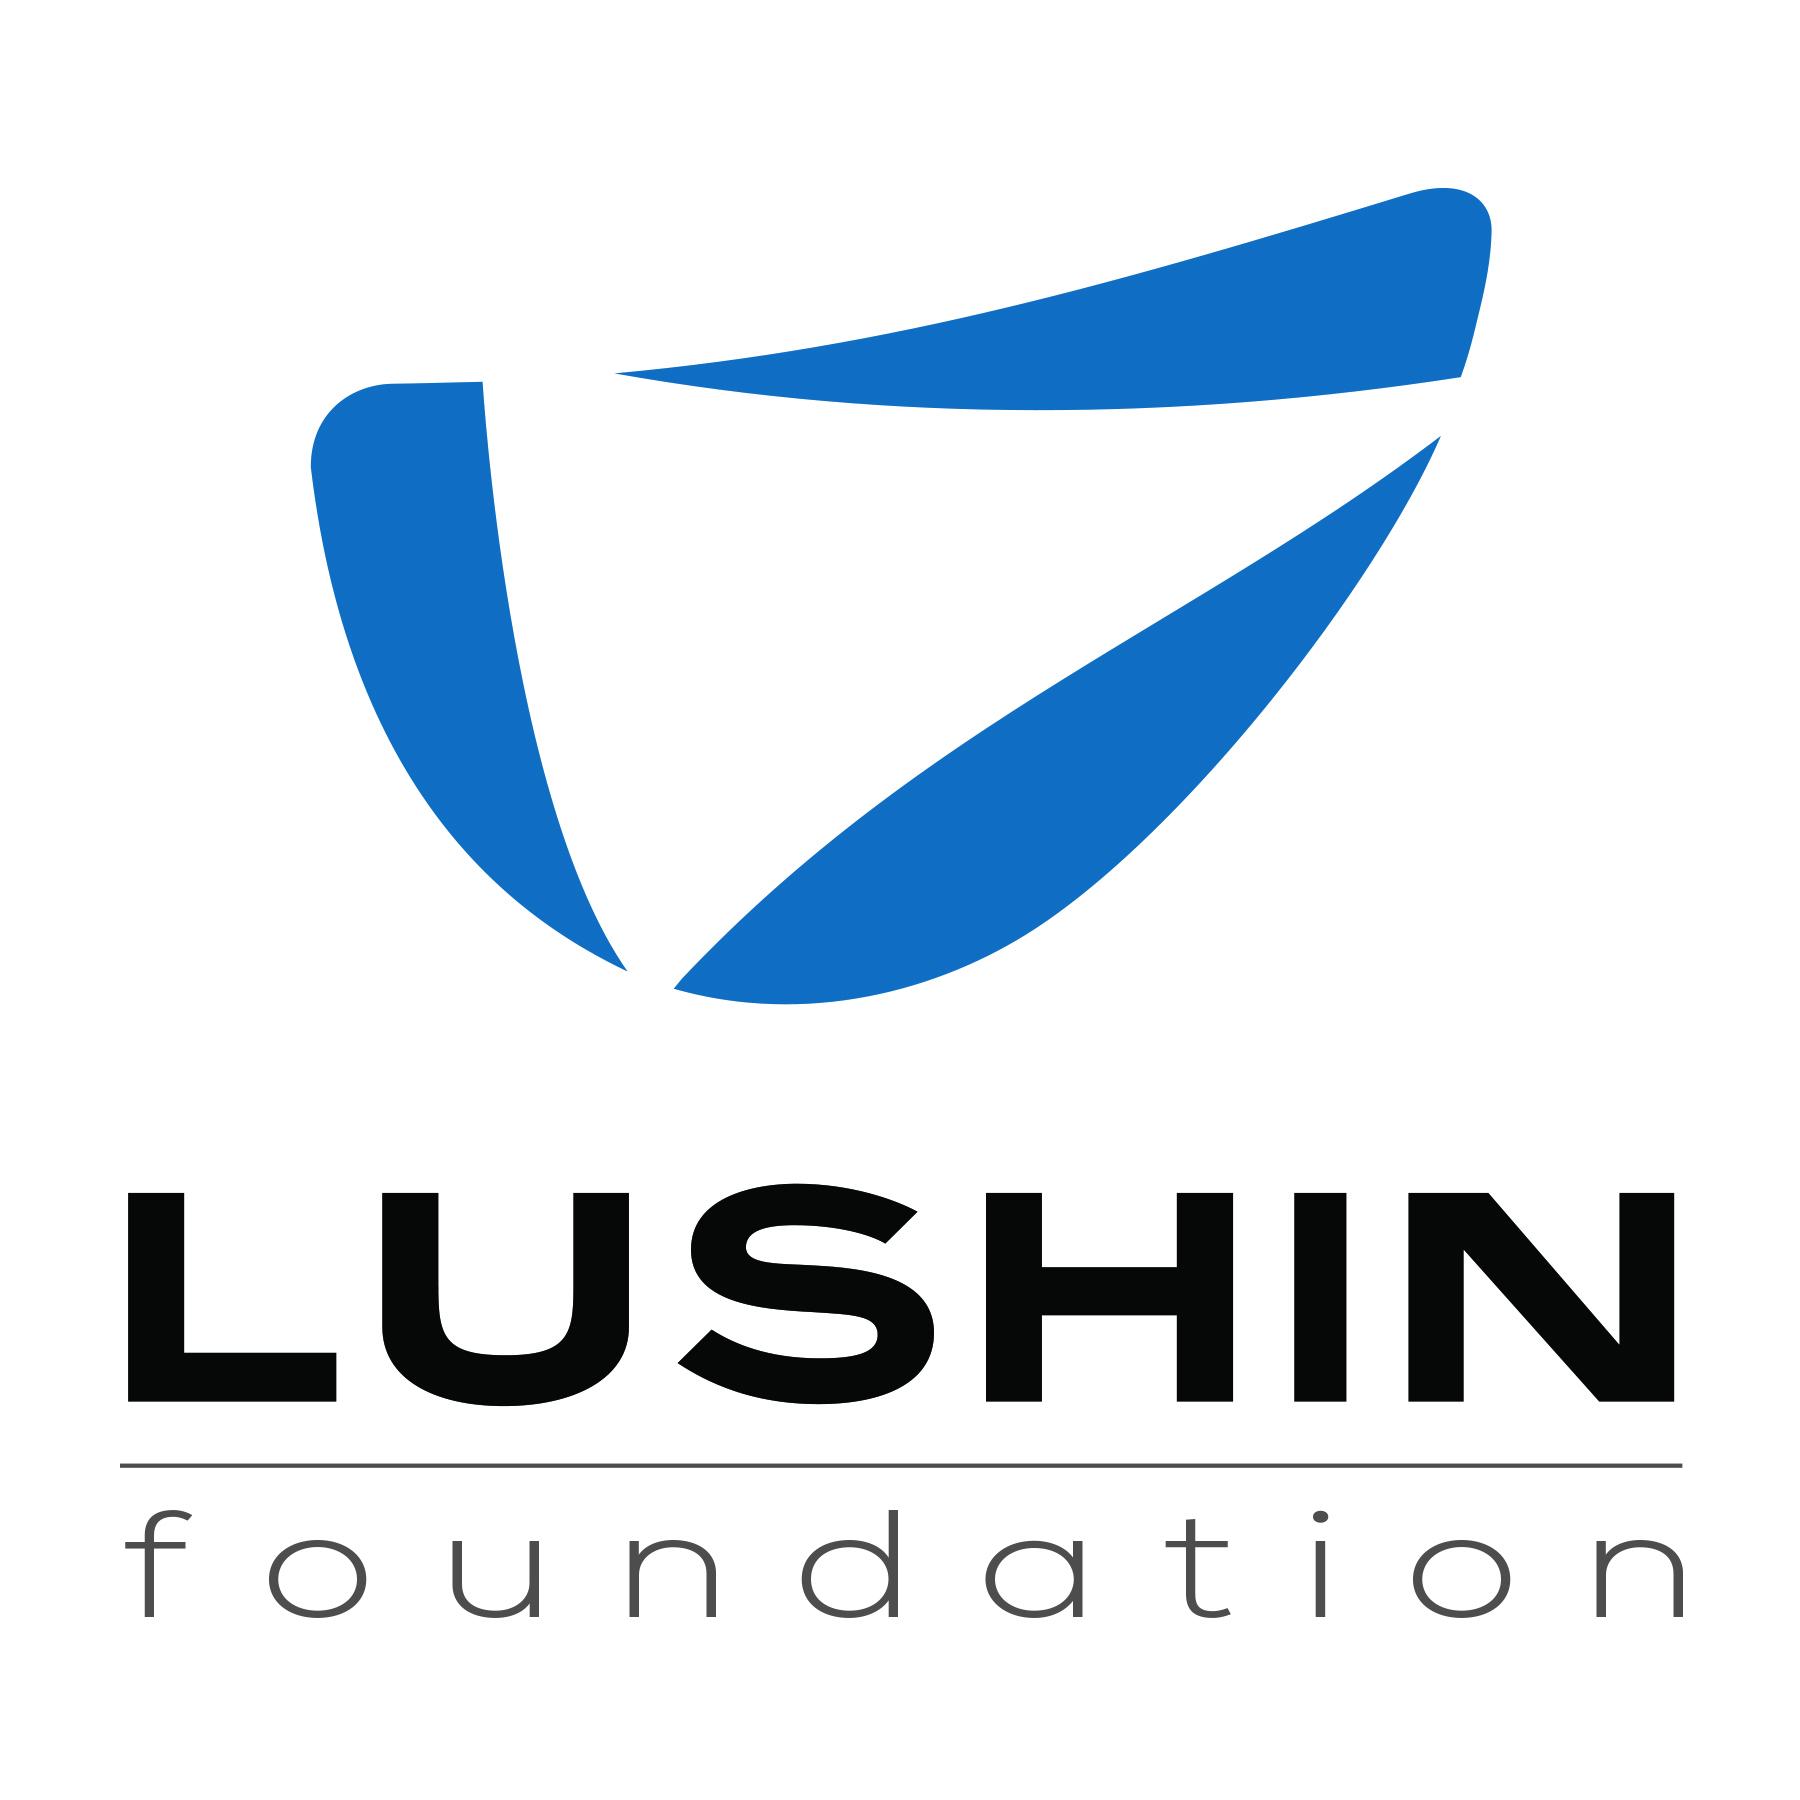 Lushin_foundation vert.jpg